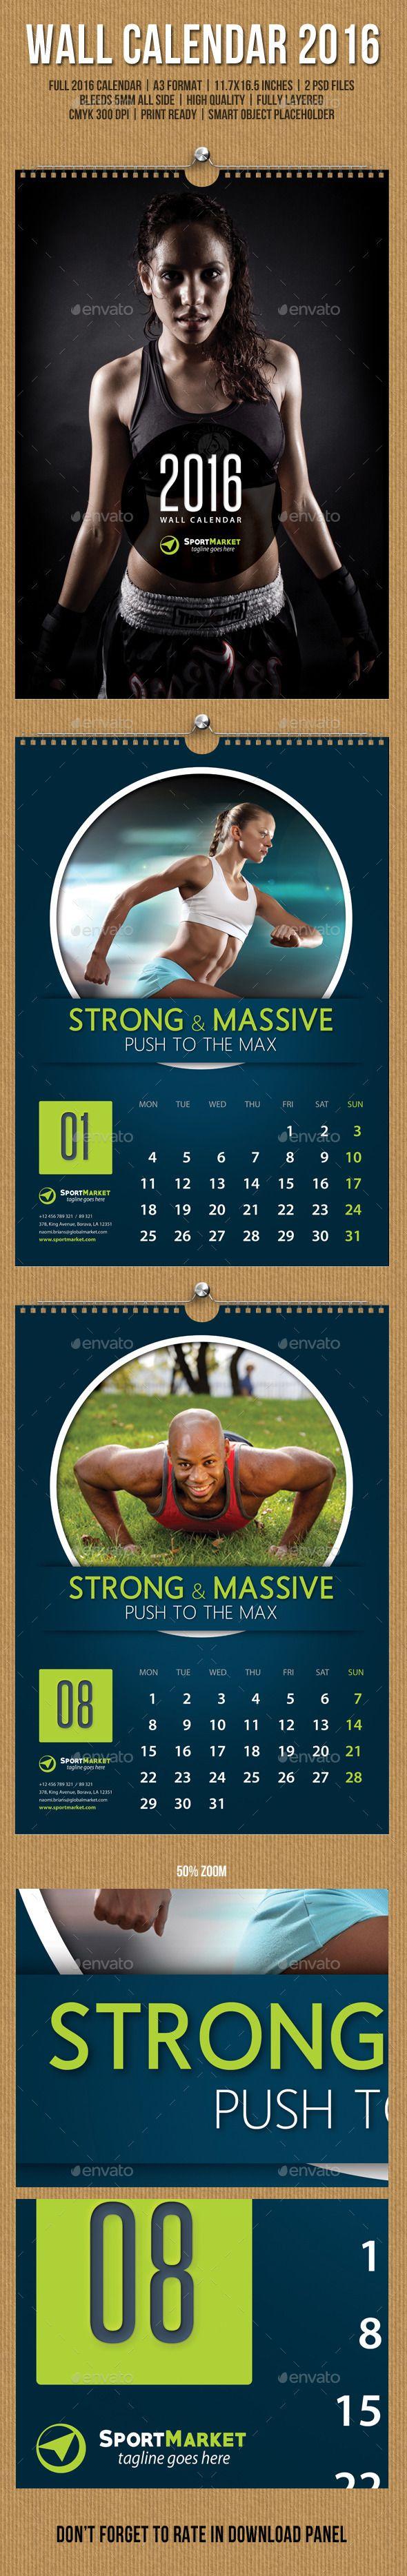 Wall Calendar A3 2016 PSD Template #design Download: http://graphicriver.net/item/wall-calendar-a3-2016-v20/12934104?ref=ksioks